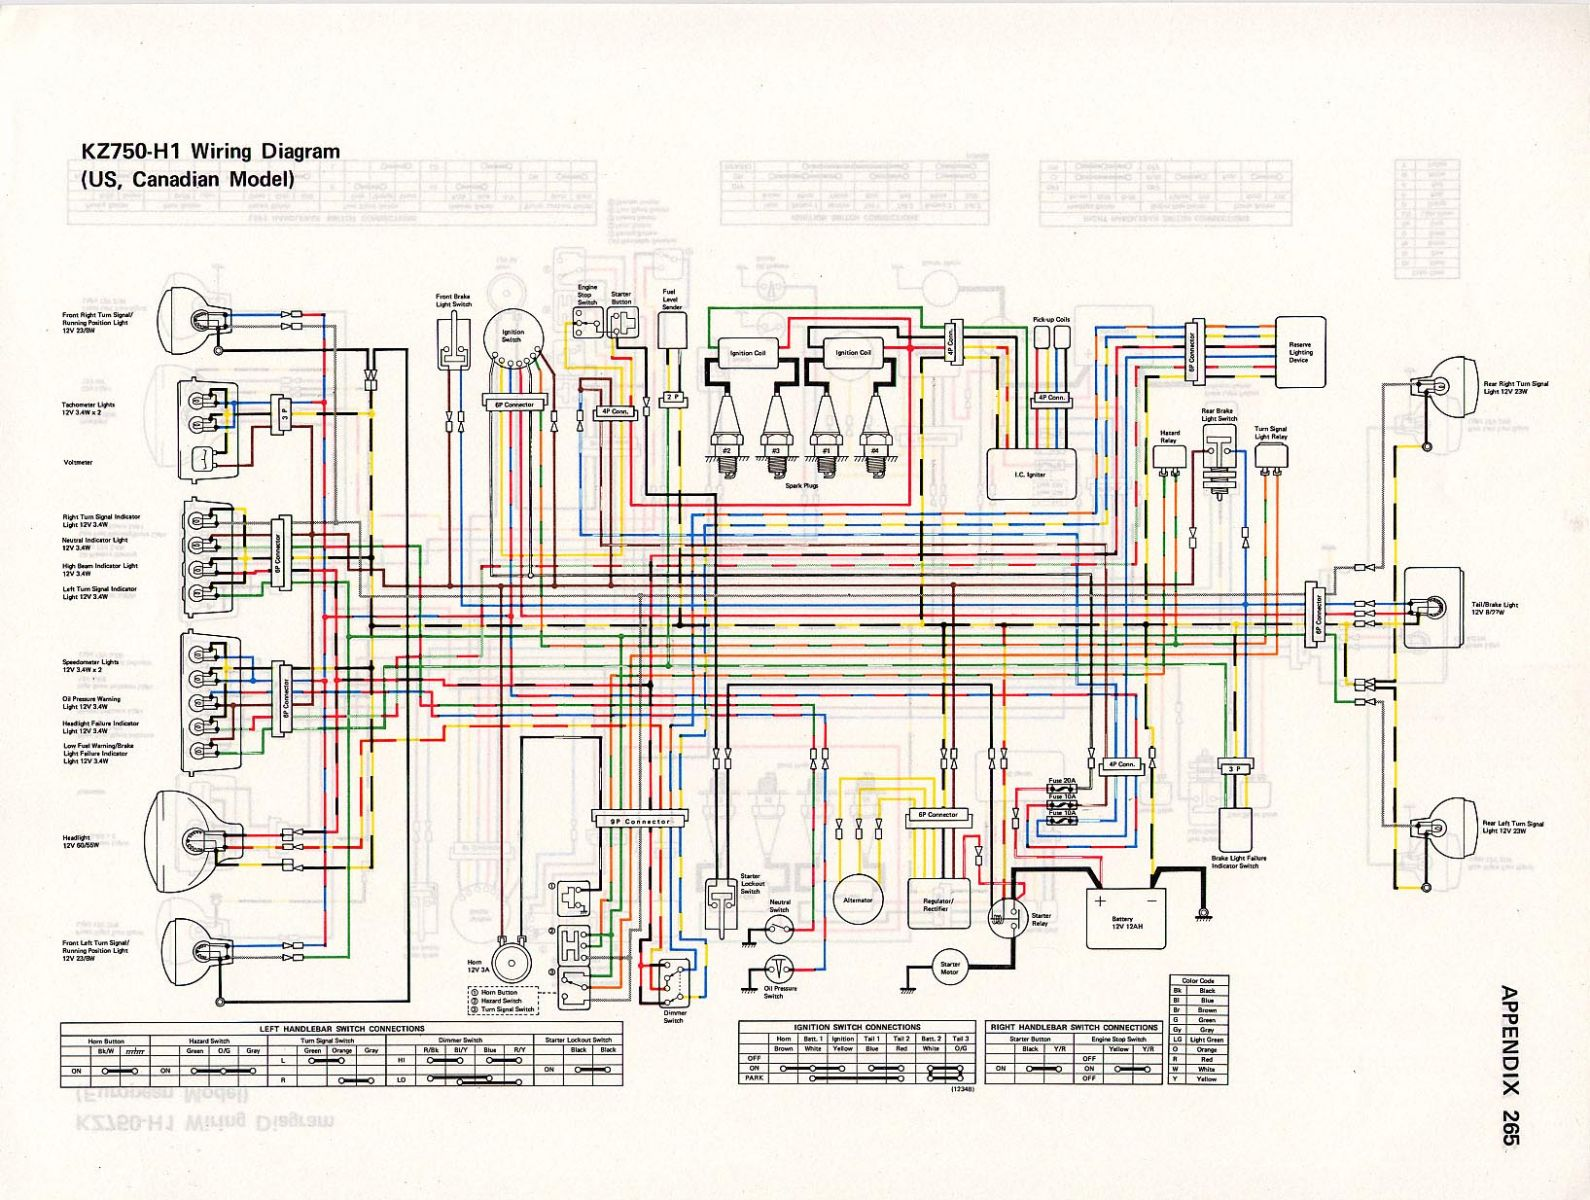 hight resolution of 1980 kawasaki ke100 wiring diagram auto electrical wiring diagram rh harvard edu co uk iico me